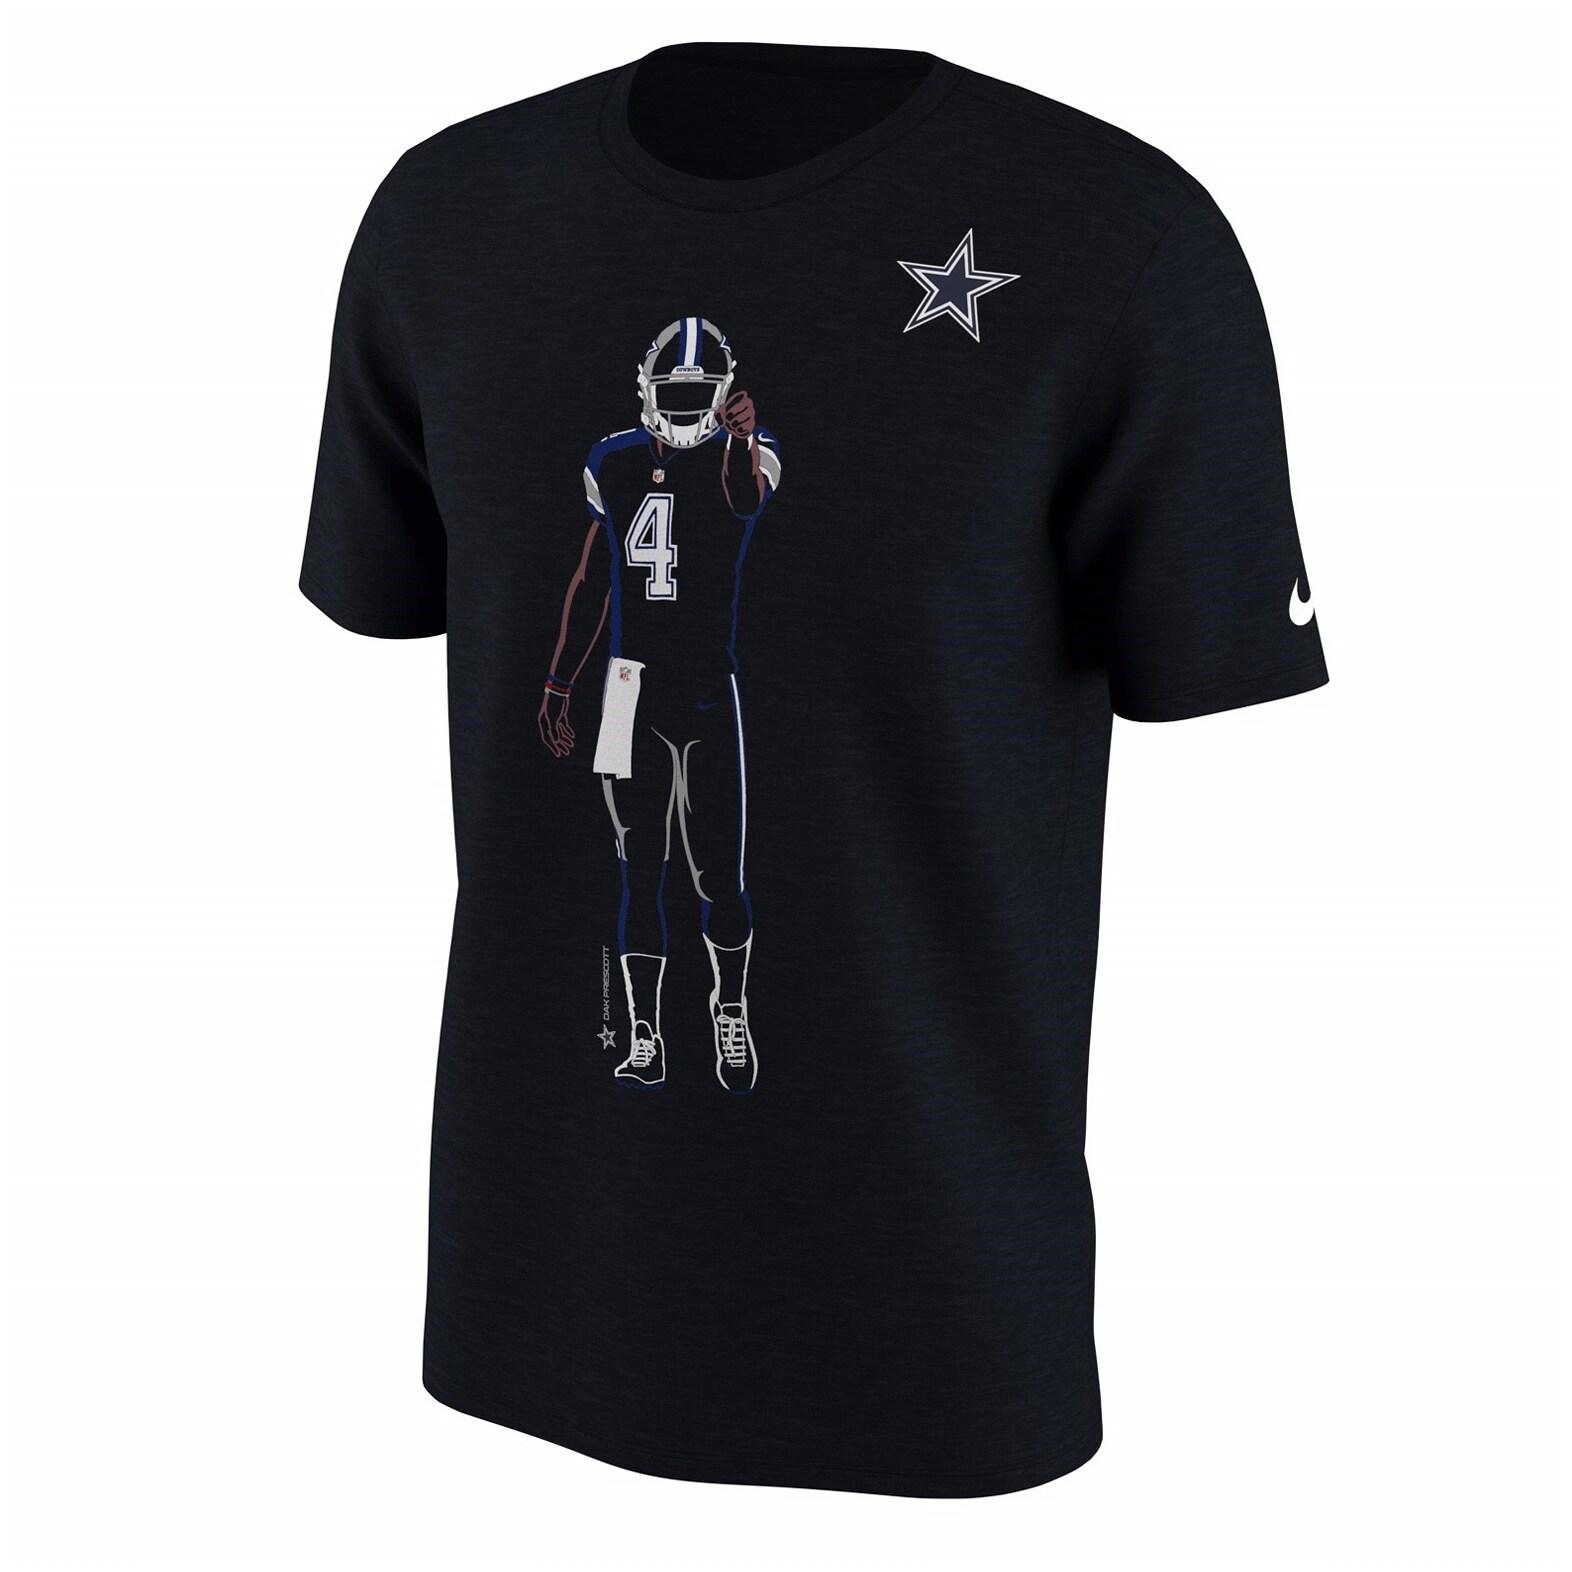 Dak Prescott Dallas Cowboys Nike Player Silhouette 2.0 Name & Number T-Shirt - Black